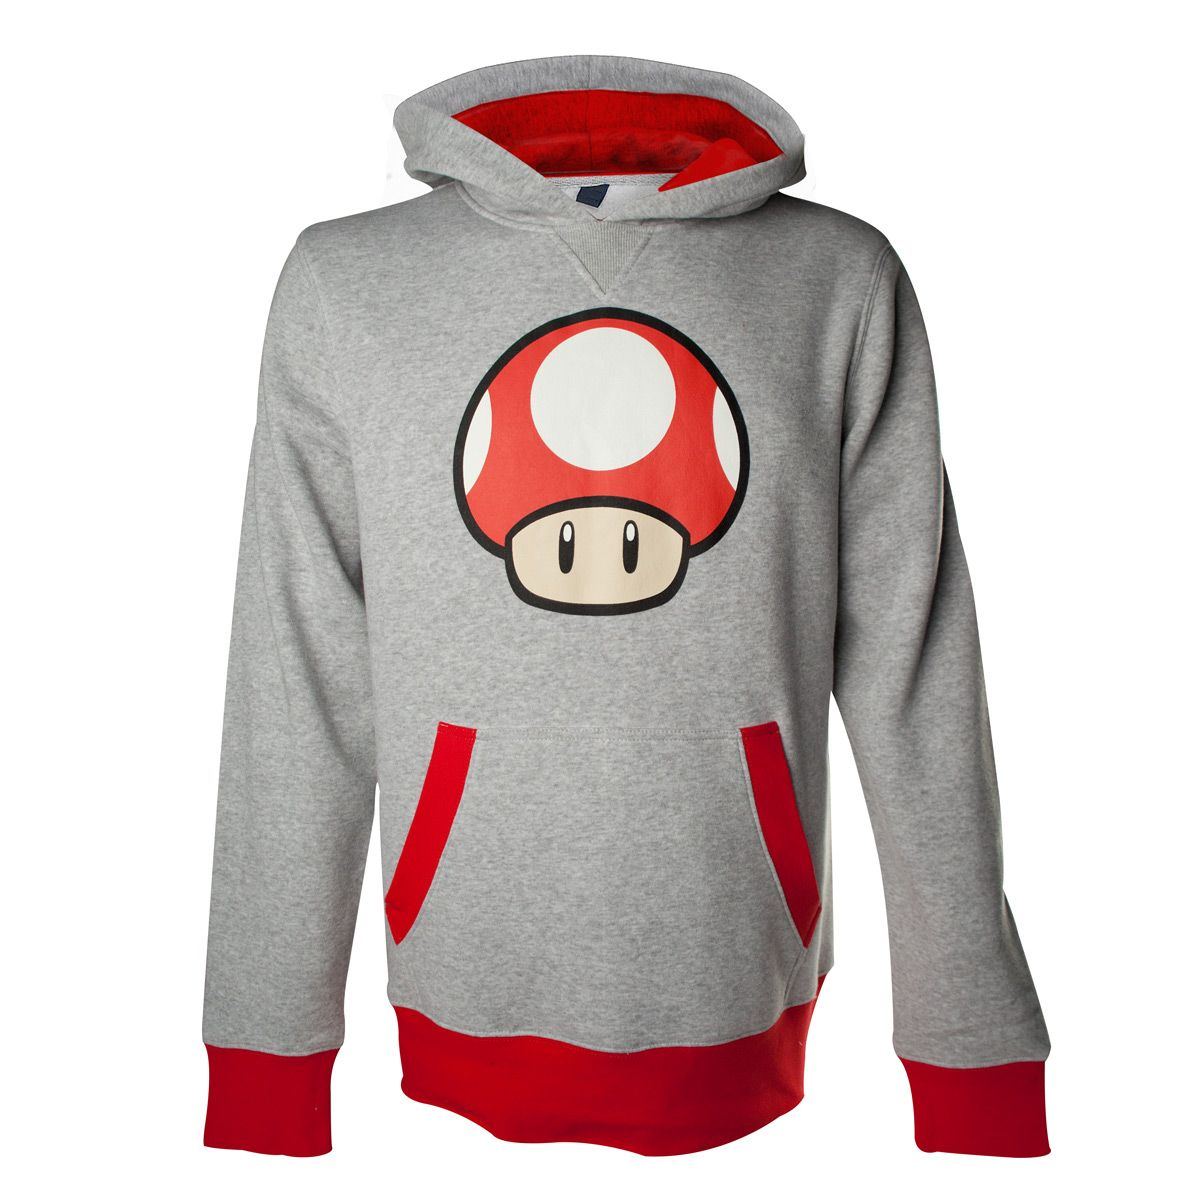 Mario Mushroom Hooded Sweatshirt S-XXL # Black Hoody